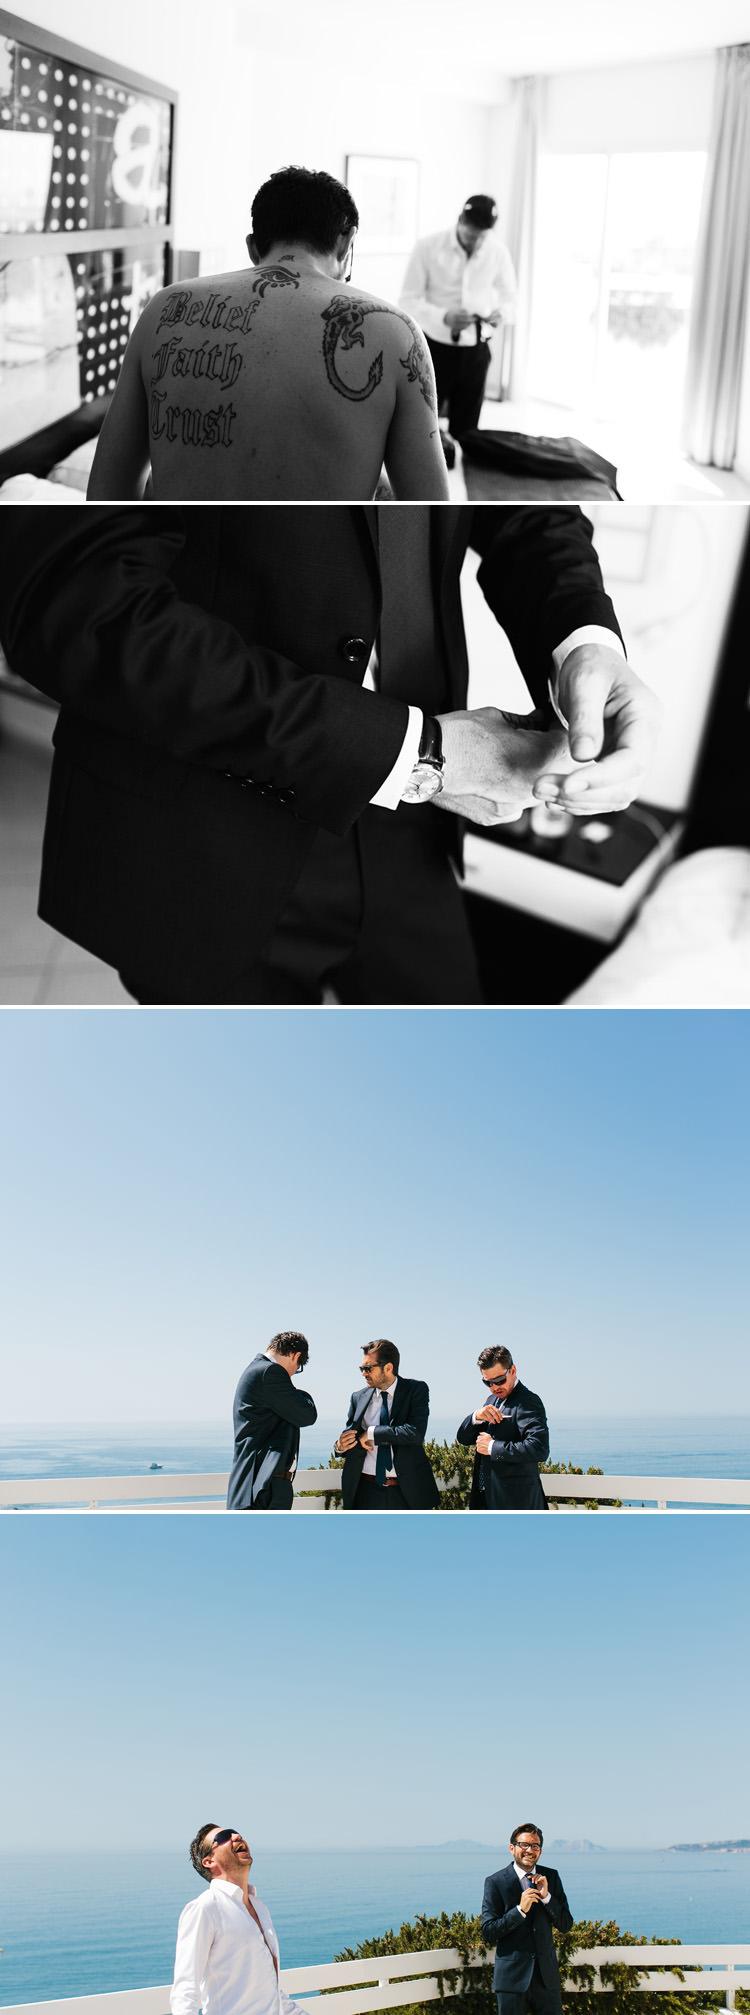 B/W portrait of the groom